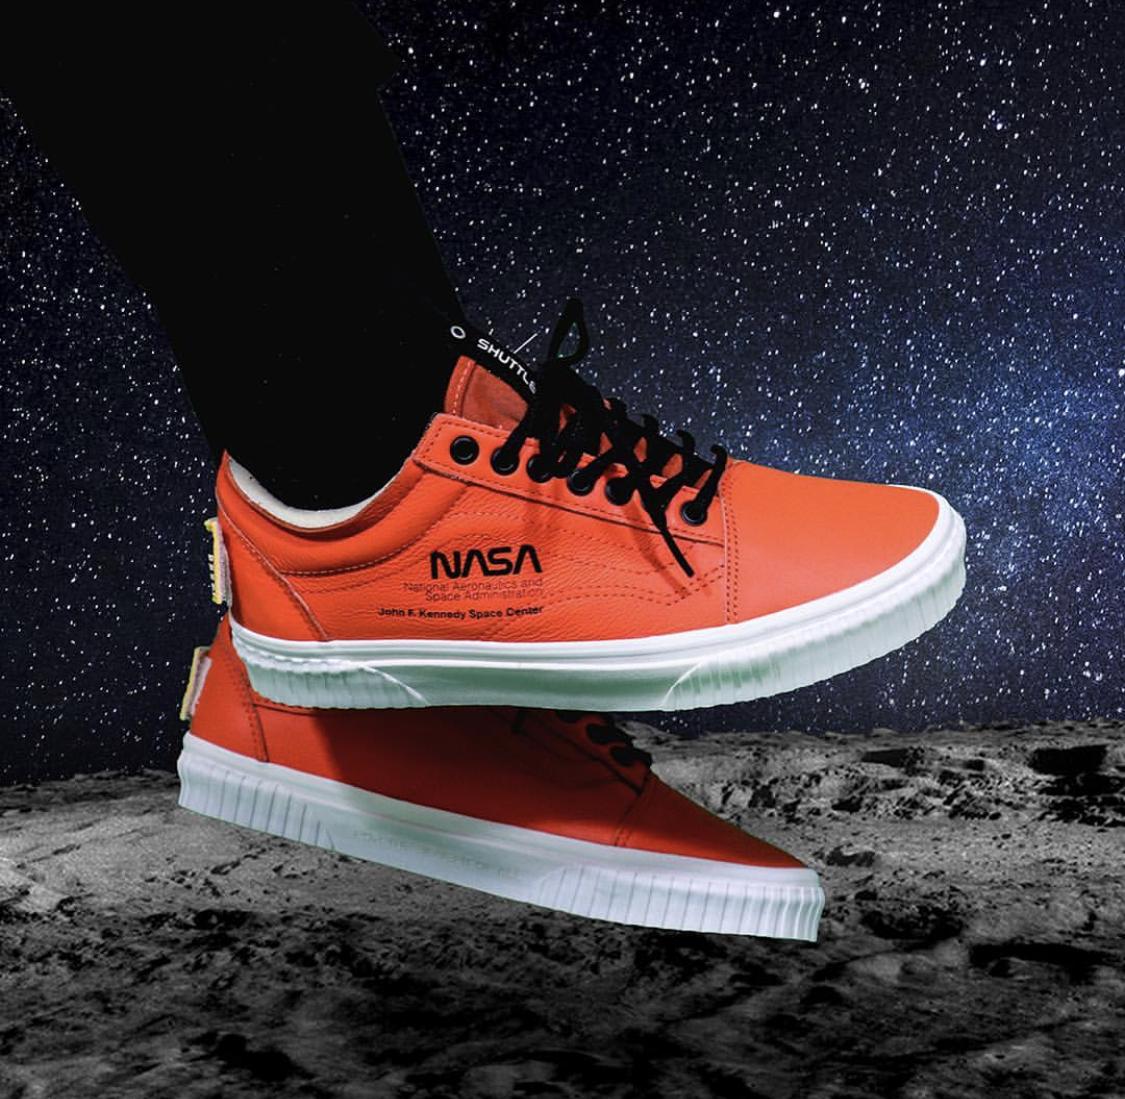 Restock: NASA x Vans Old Skool